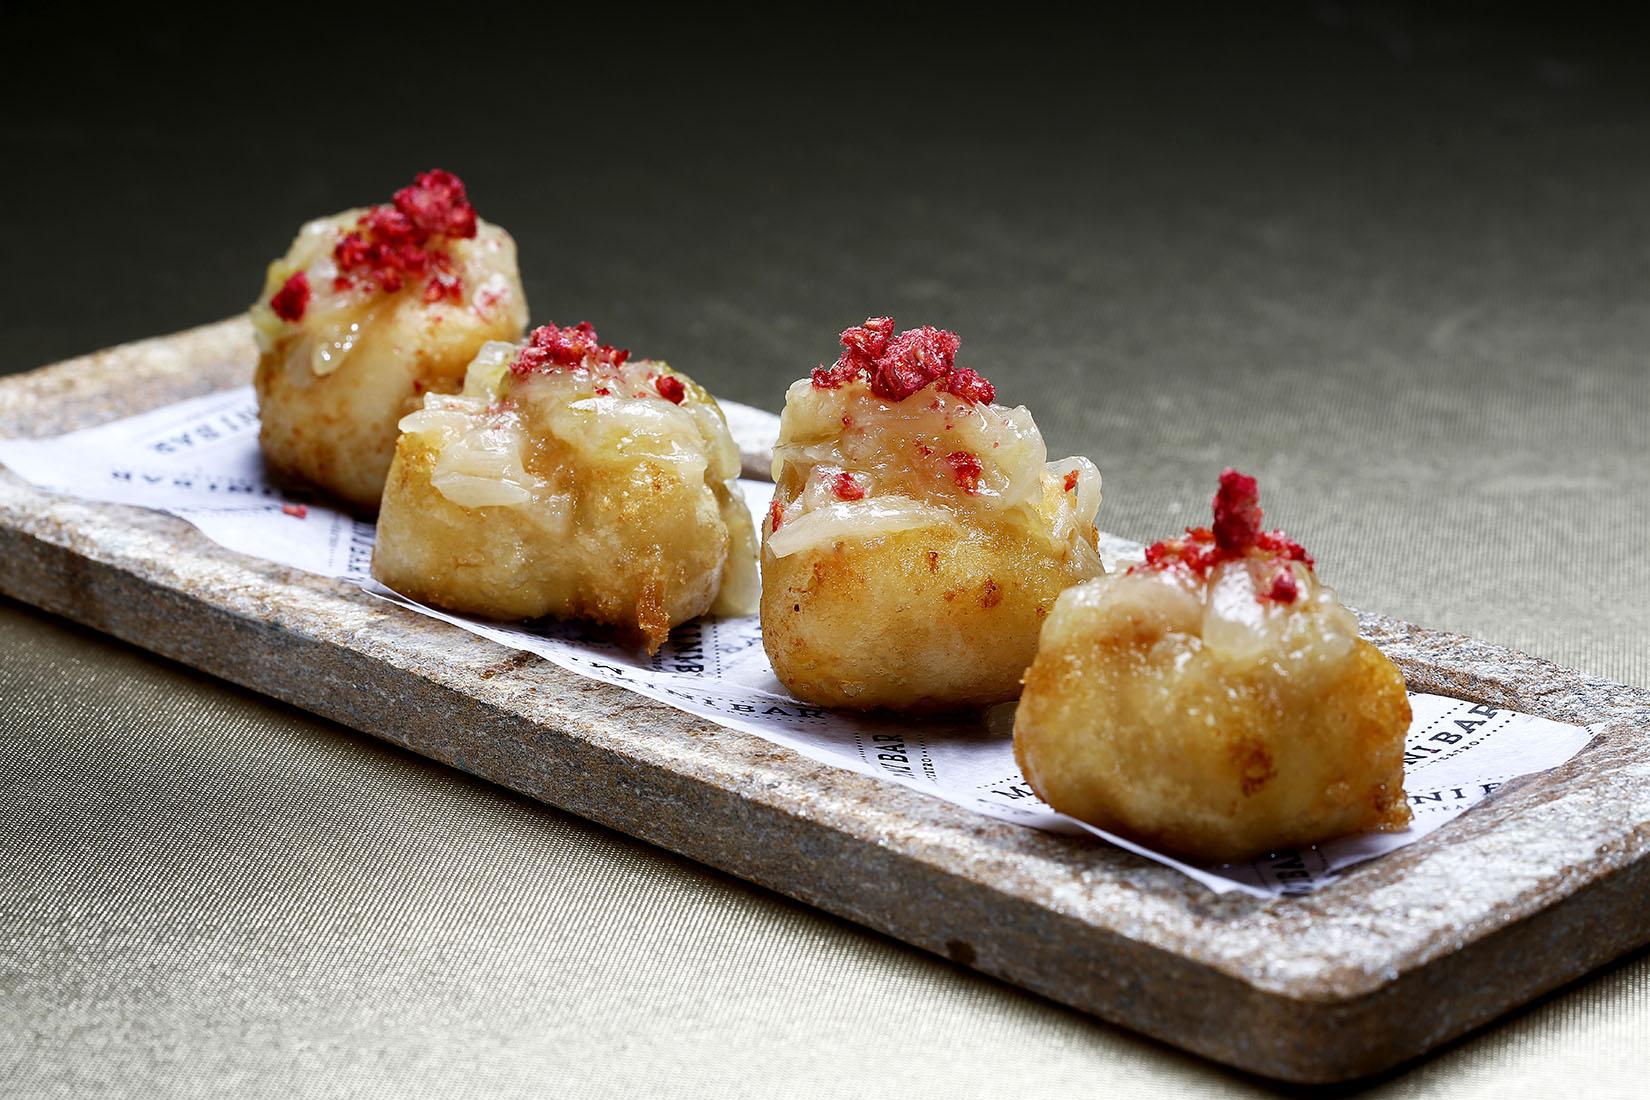 Have You Heard About Chef Avillez's Gastronomic Bar? mini bar Have You Heard About Chef Avillez's Gastronomic Bar? Quente2